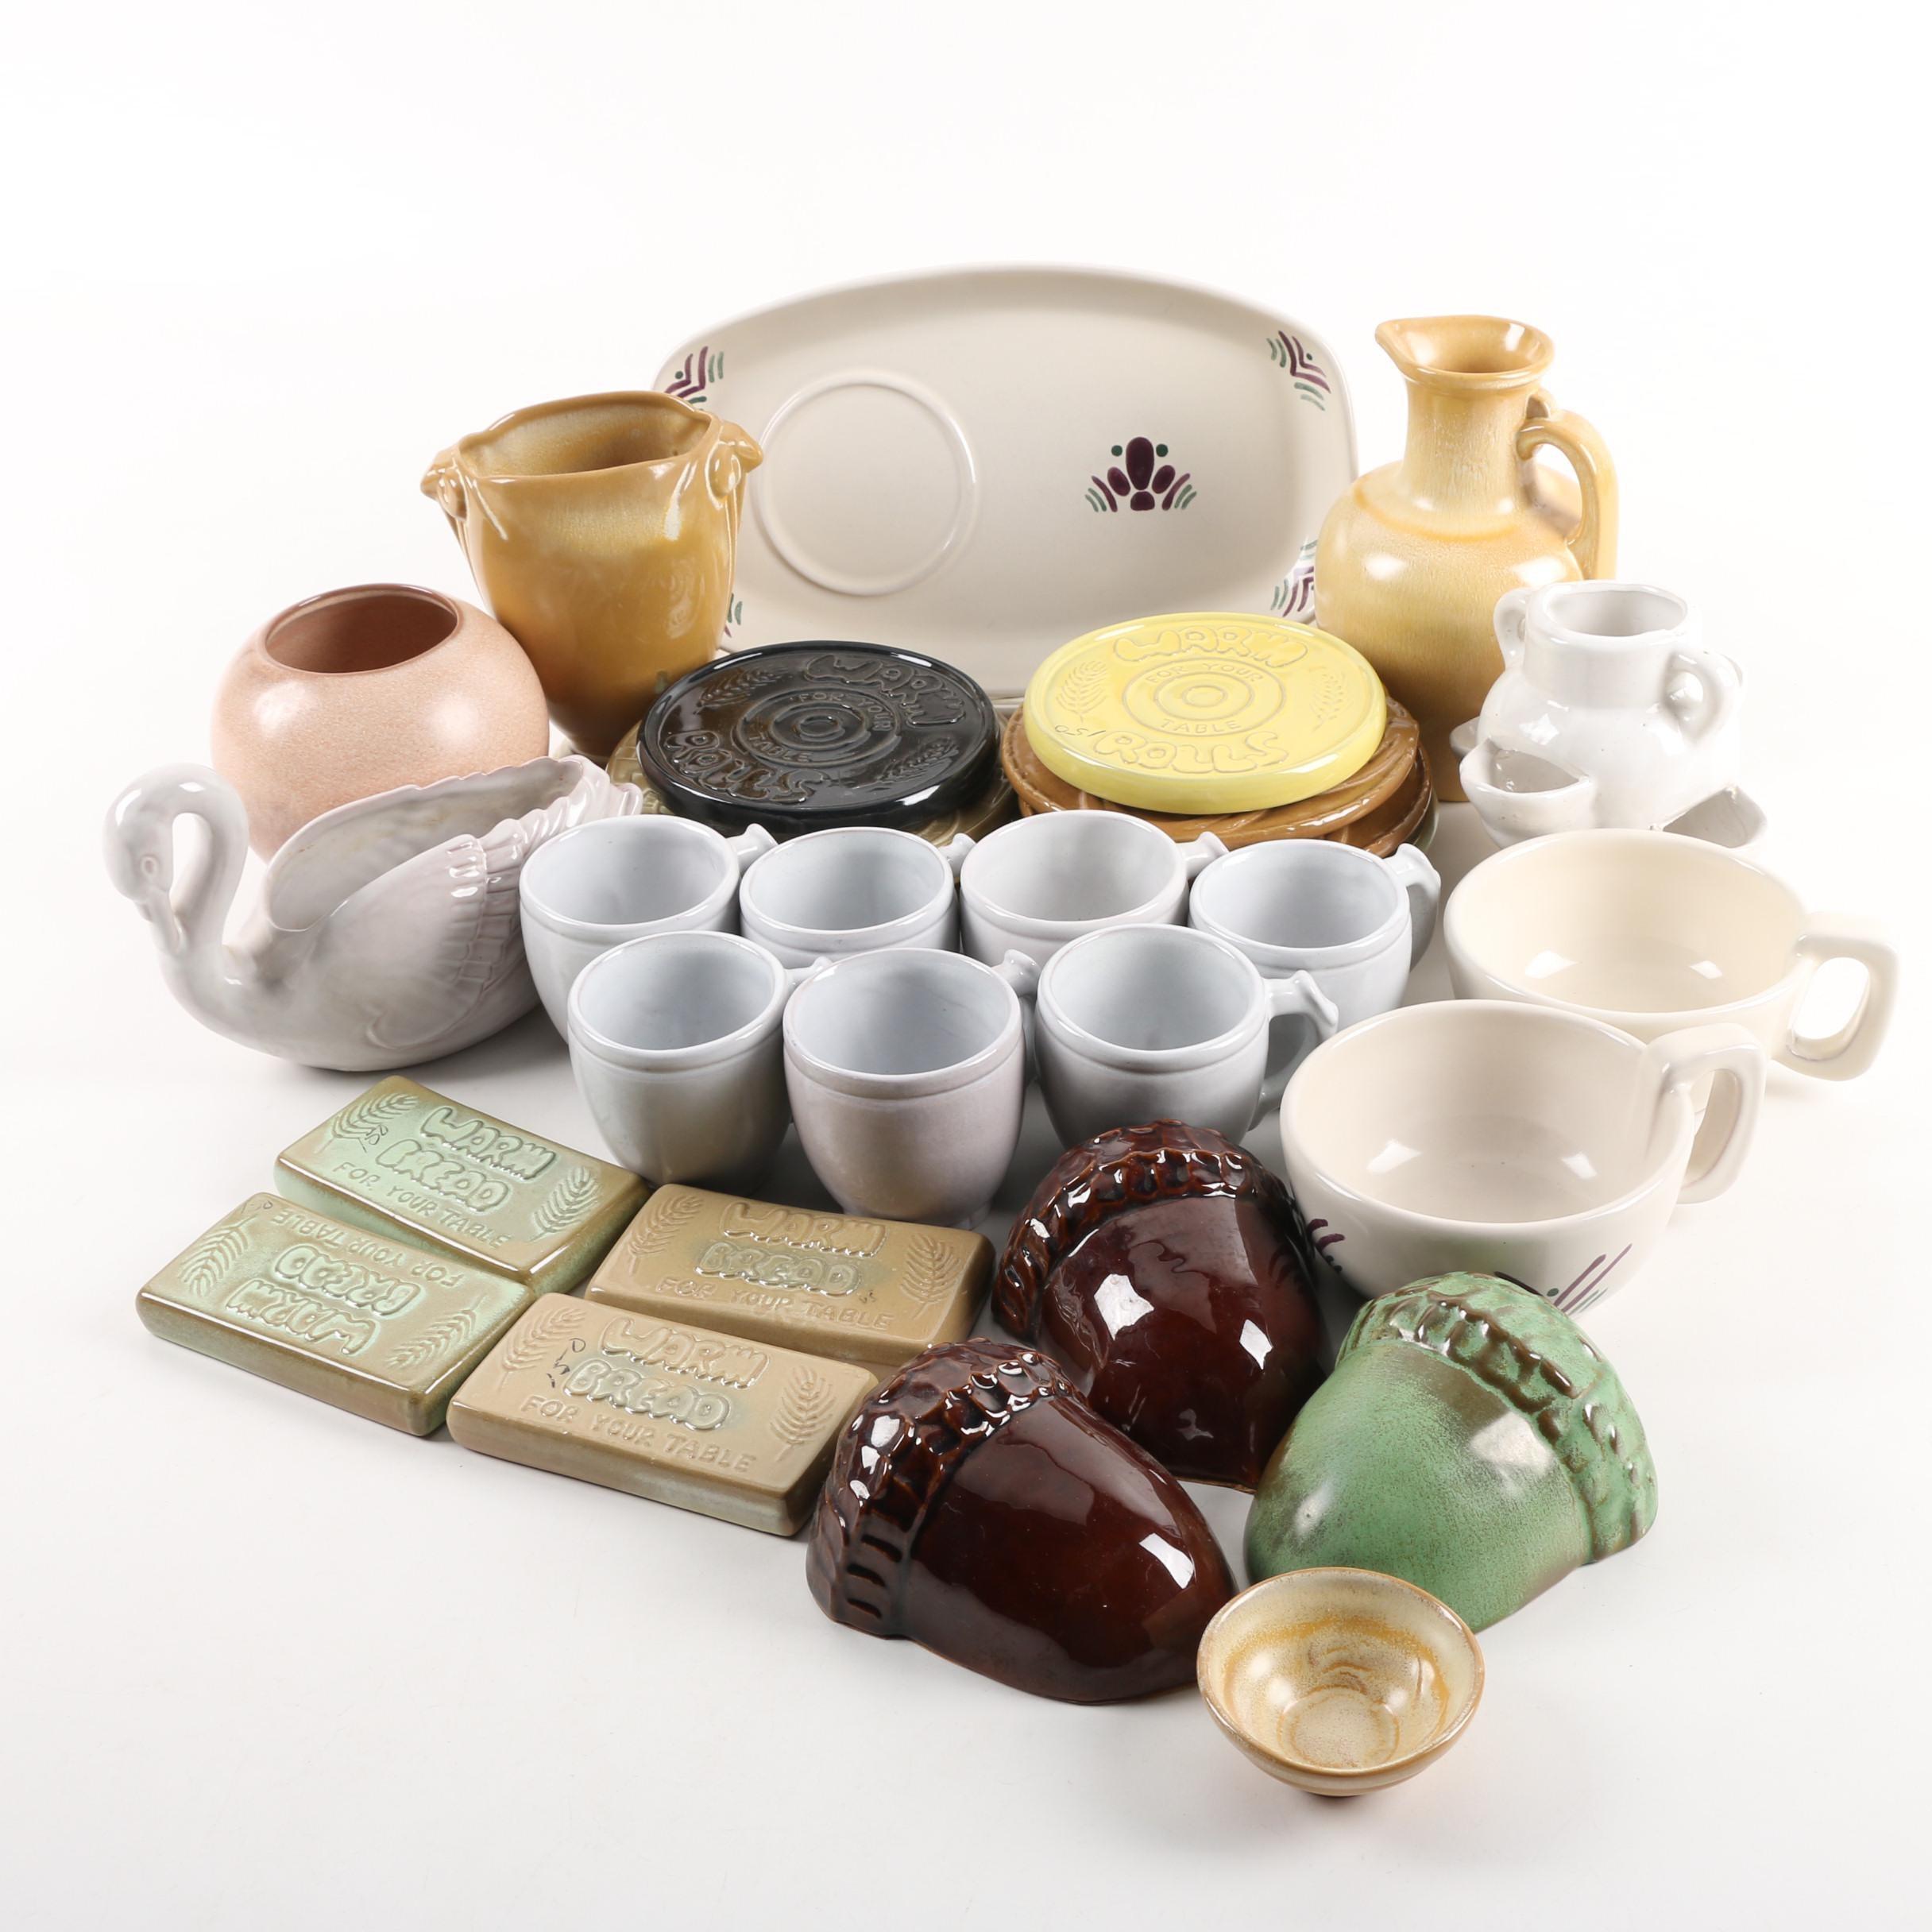 Vintage Frankoma Pottery Vases, Serveware, and Other Decor